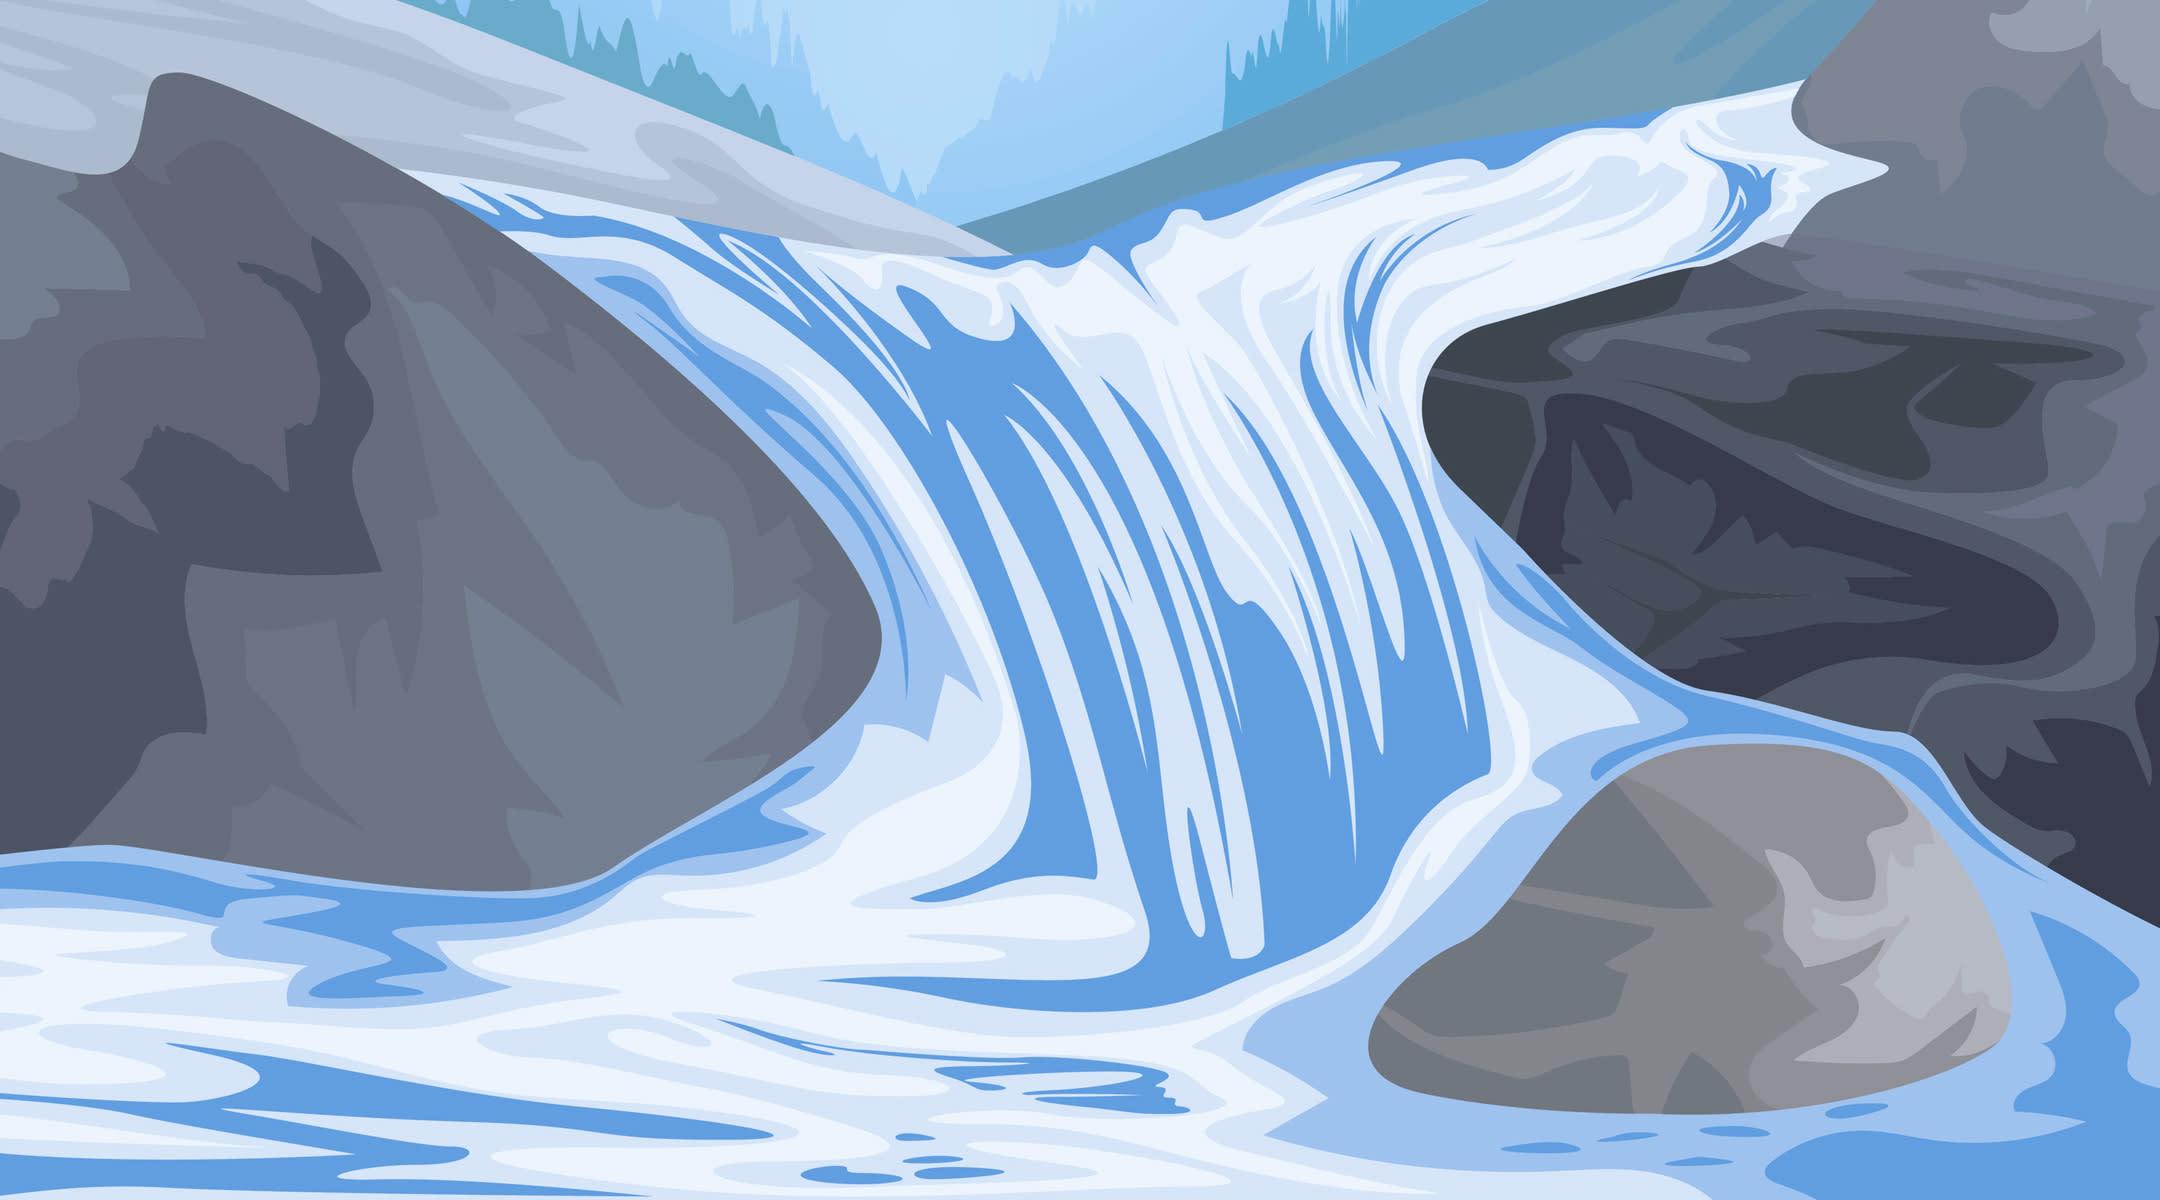 waterfall flowing through rocks